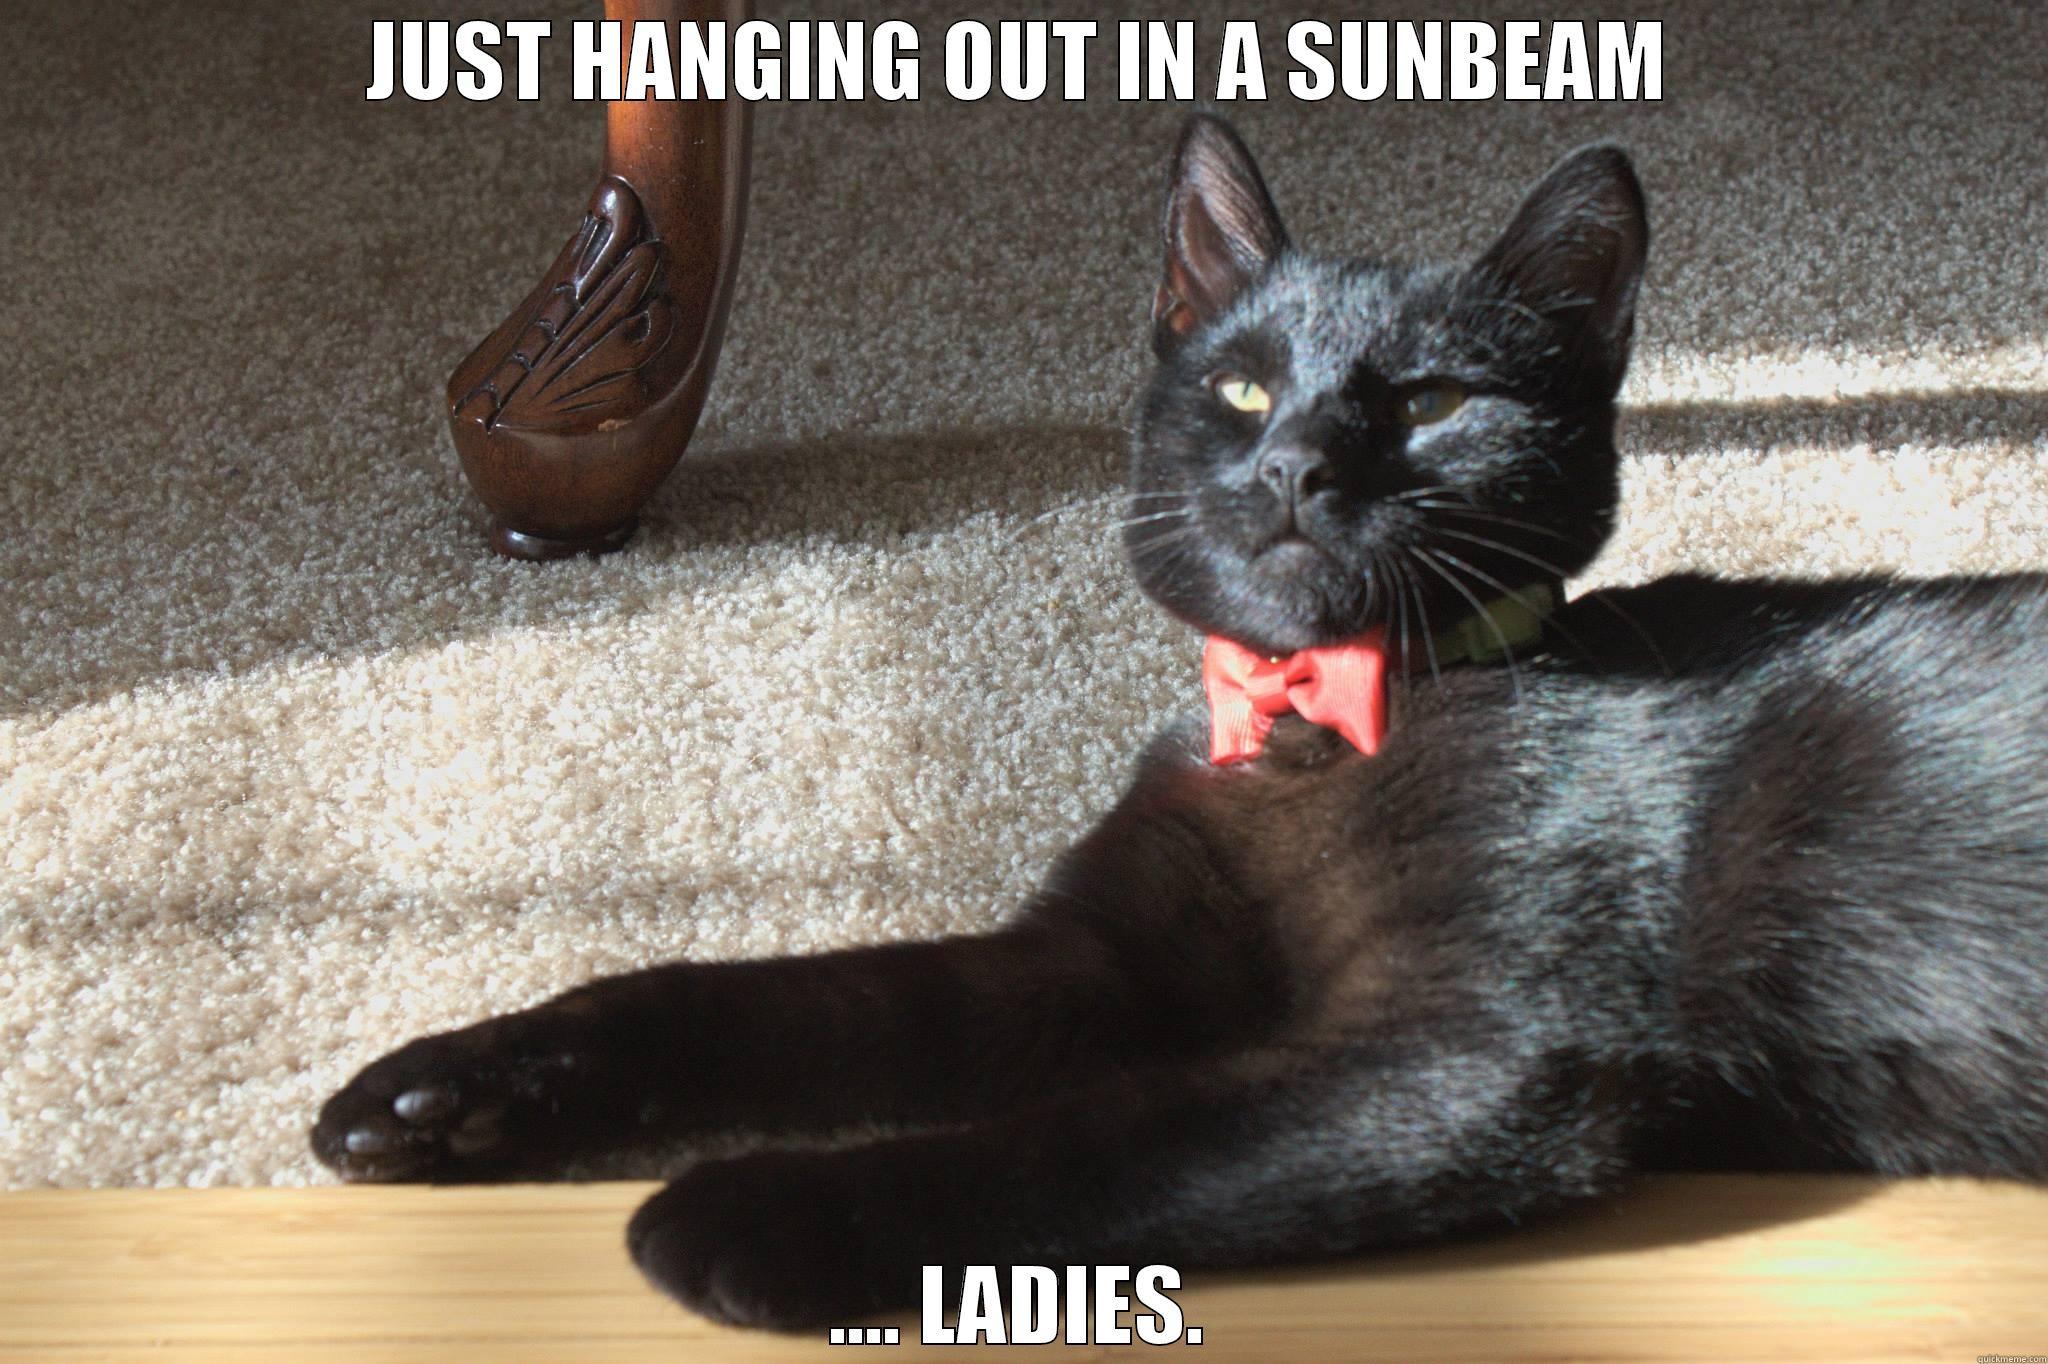 Kitten In A Bow Tie Fdfadfabbbcfeaafffde